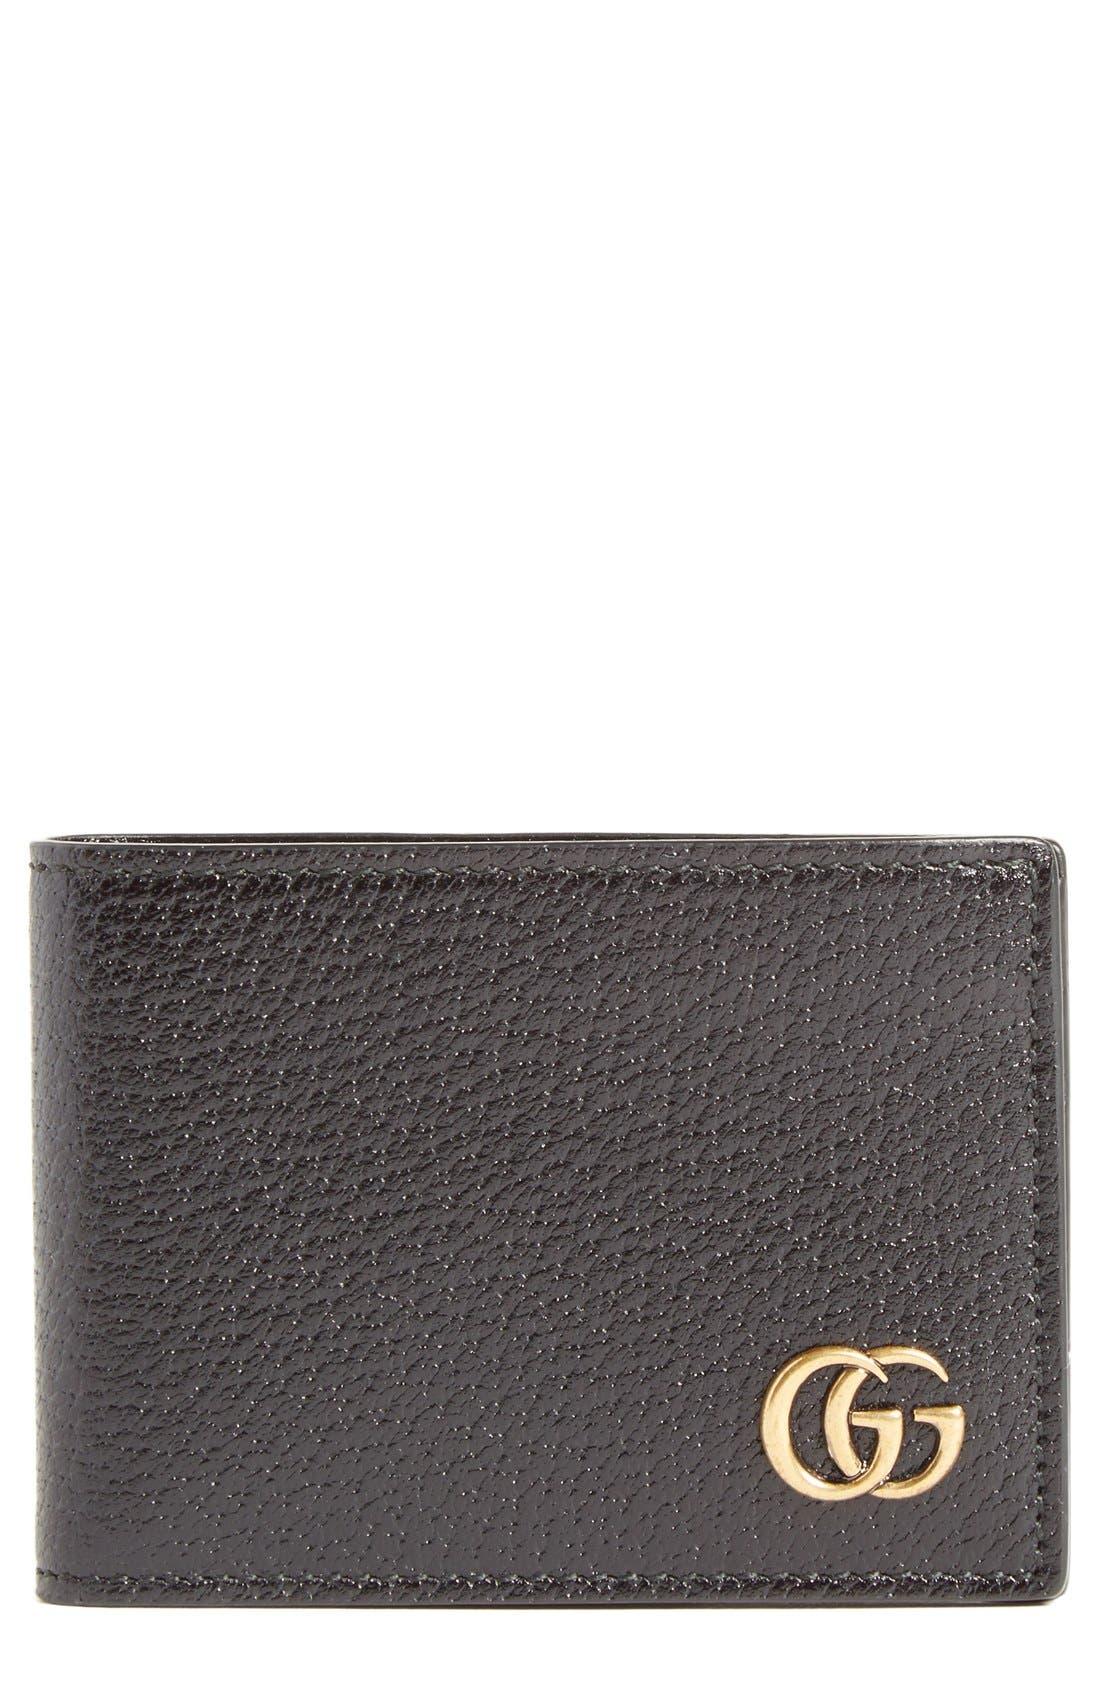 Marmont Leather Wallet,                             Main thumbnail 1, color,                             Black